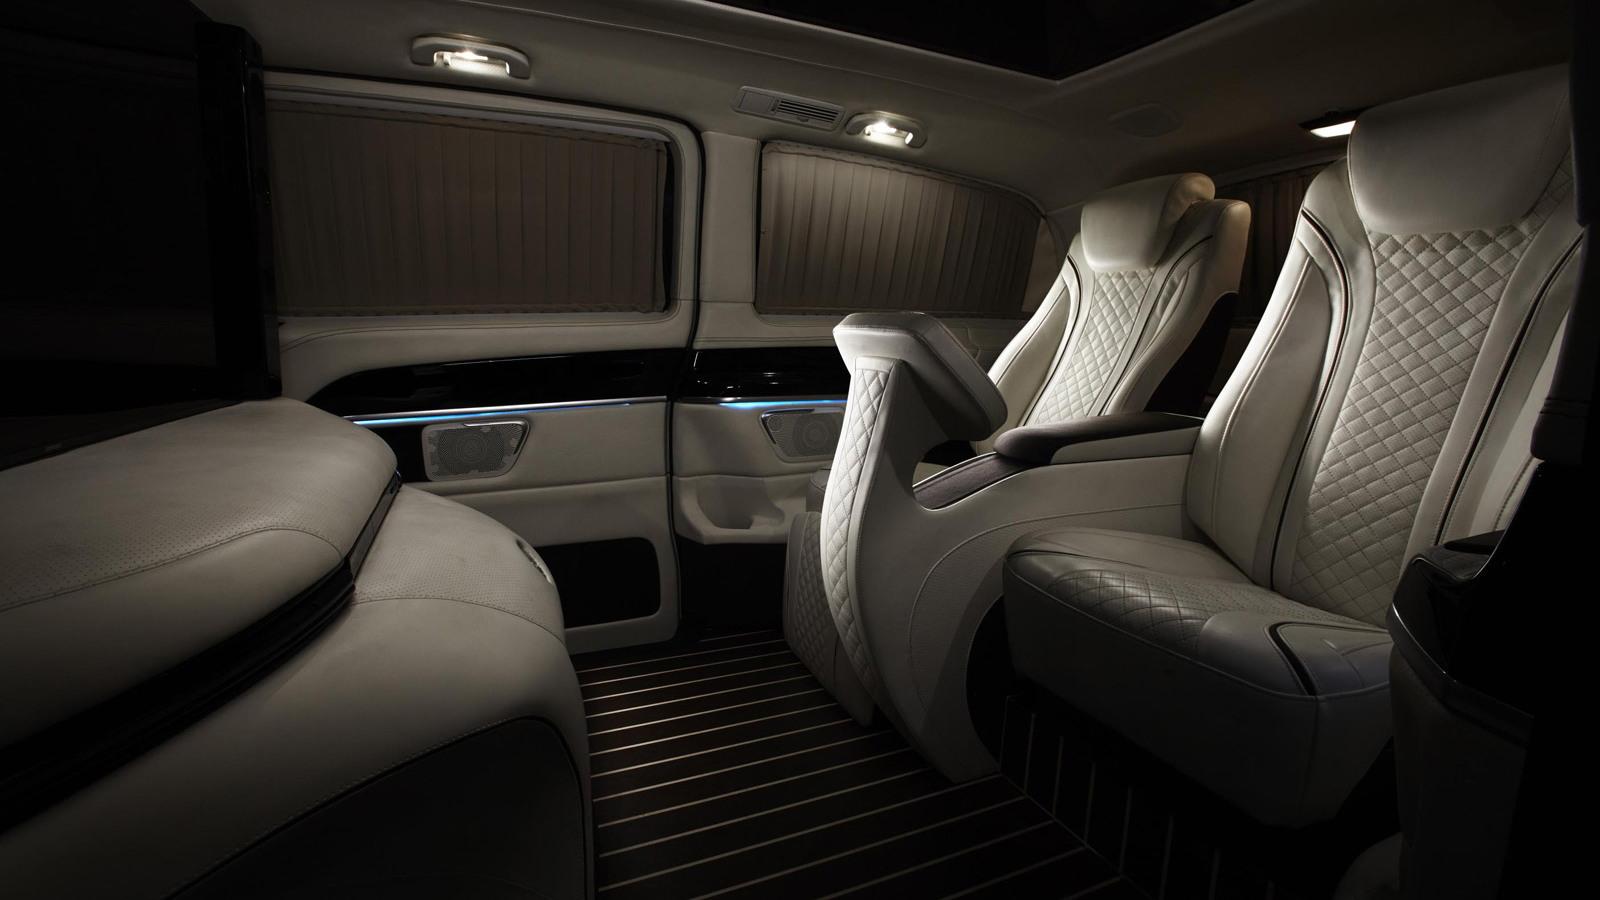 Mercedes-Benz Metris Luxury Van by HQ Custom Design, 2014 SEMA show